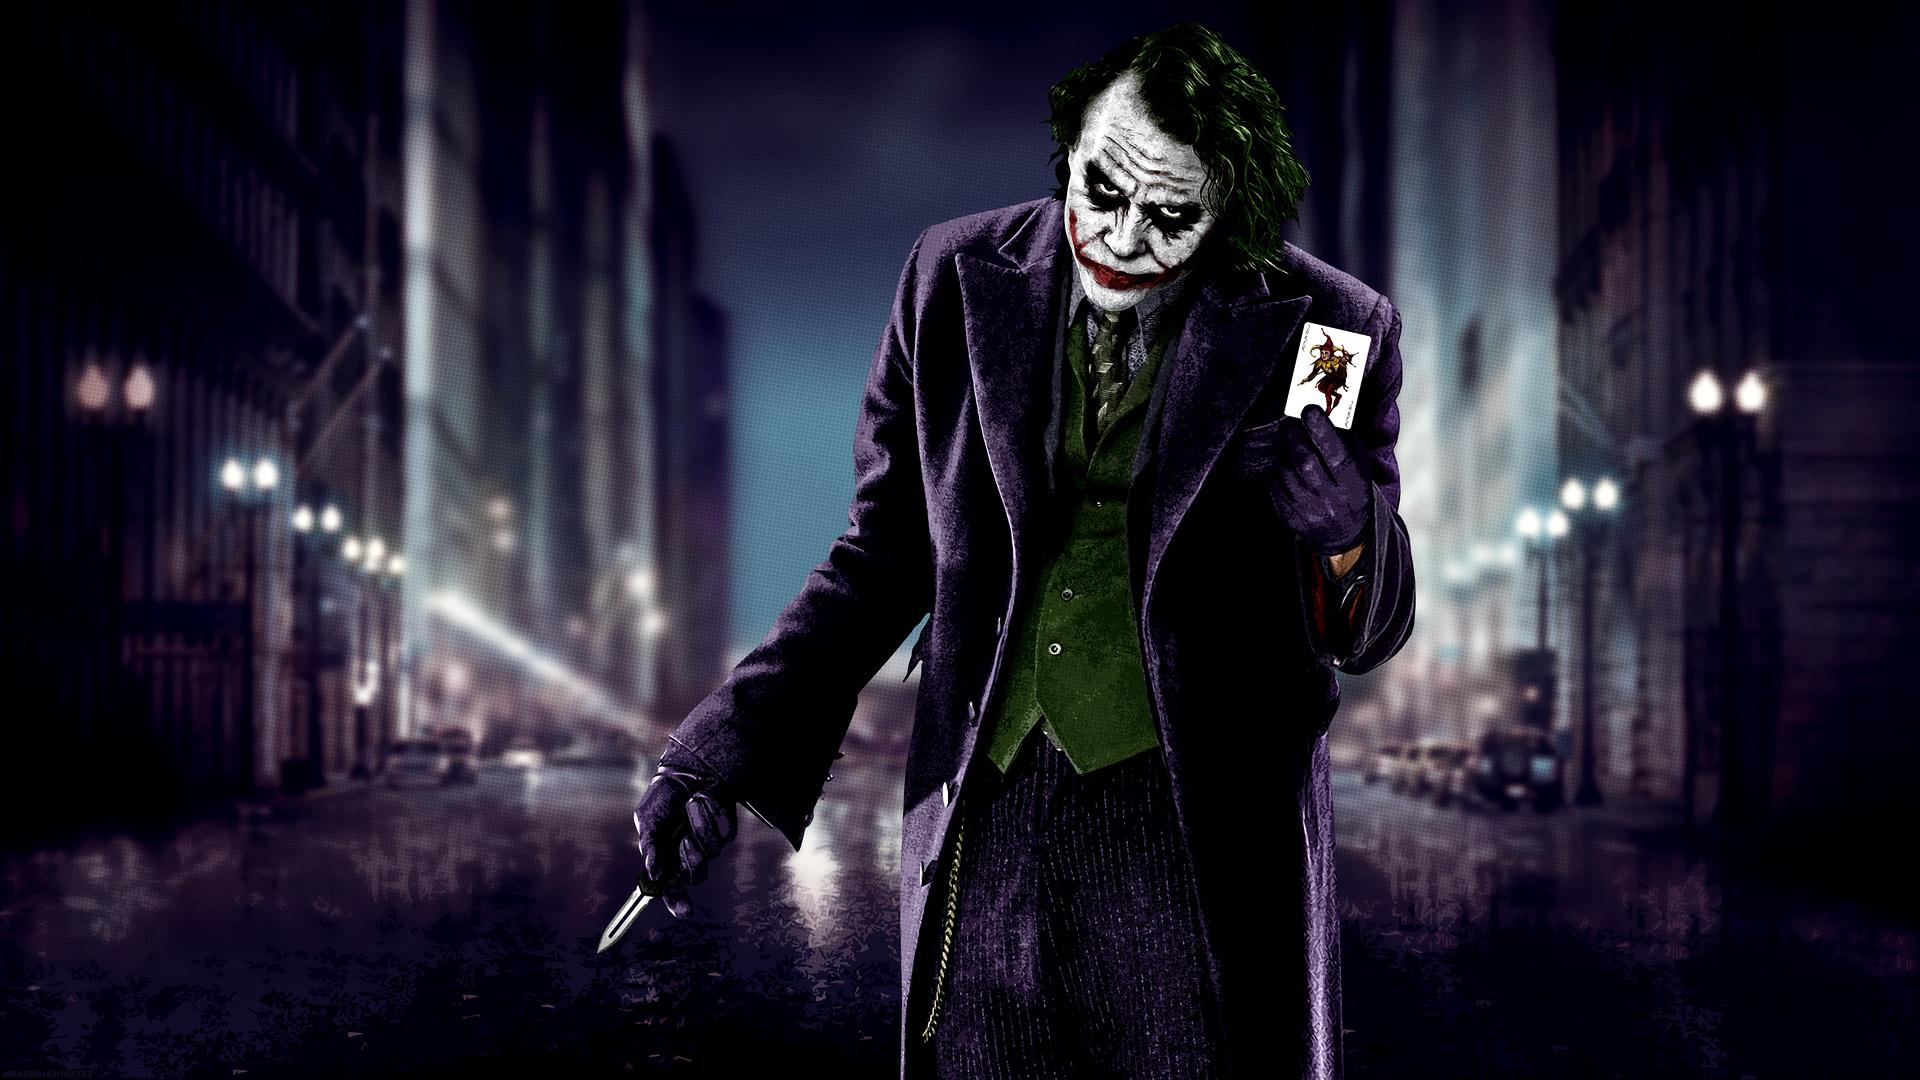 Pc Joker Wallpapers Conrad Buttwell